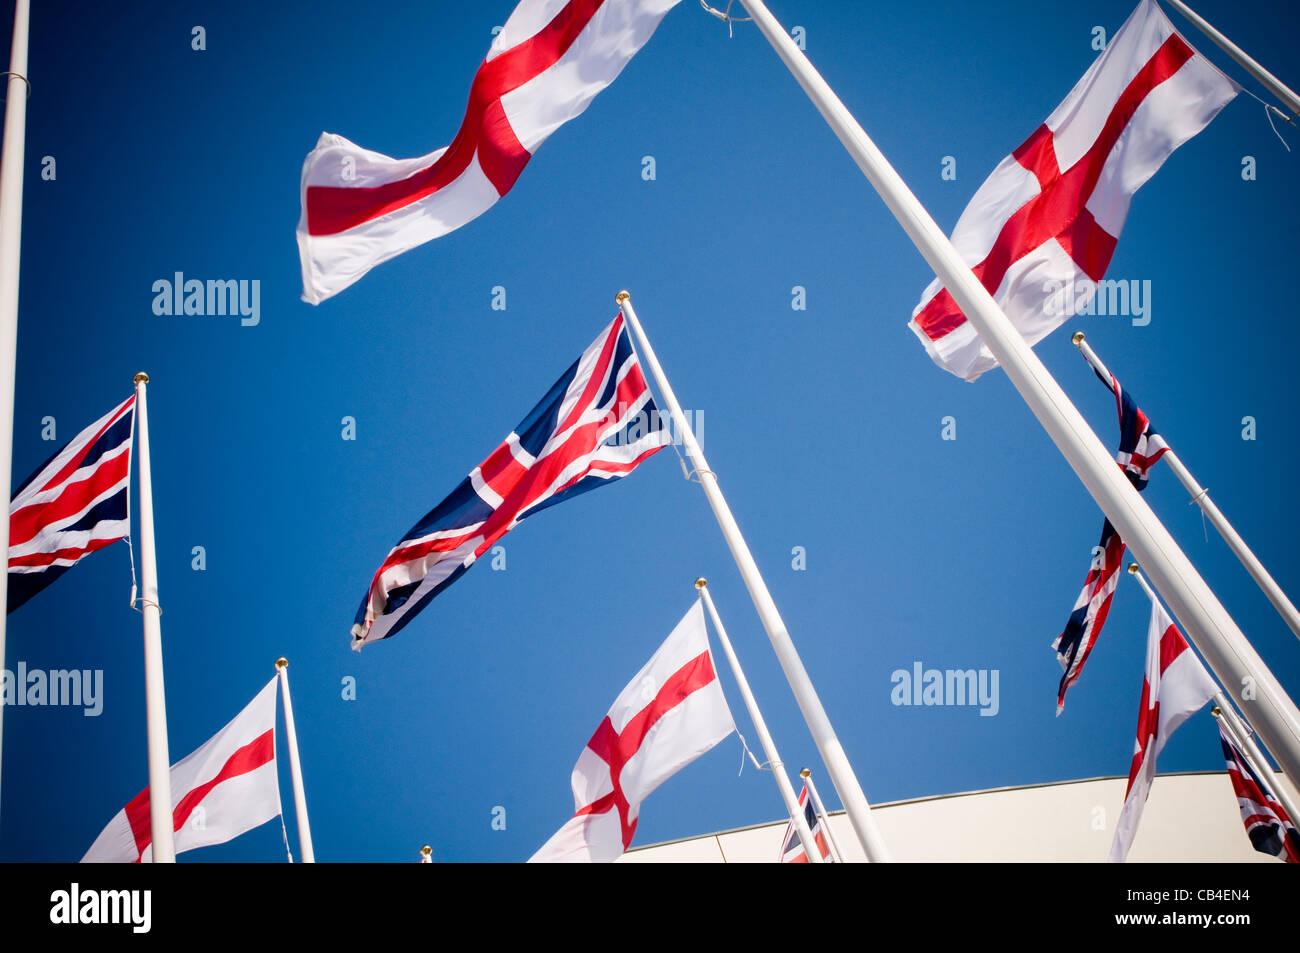 union jack british flag flags st georges cross pride uk bnp